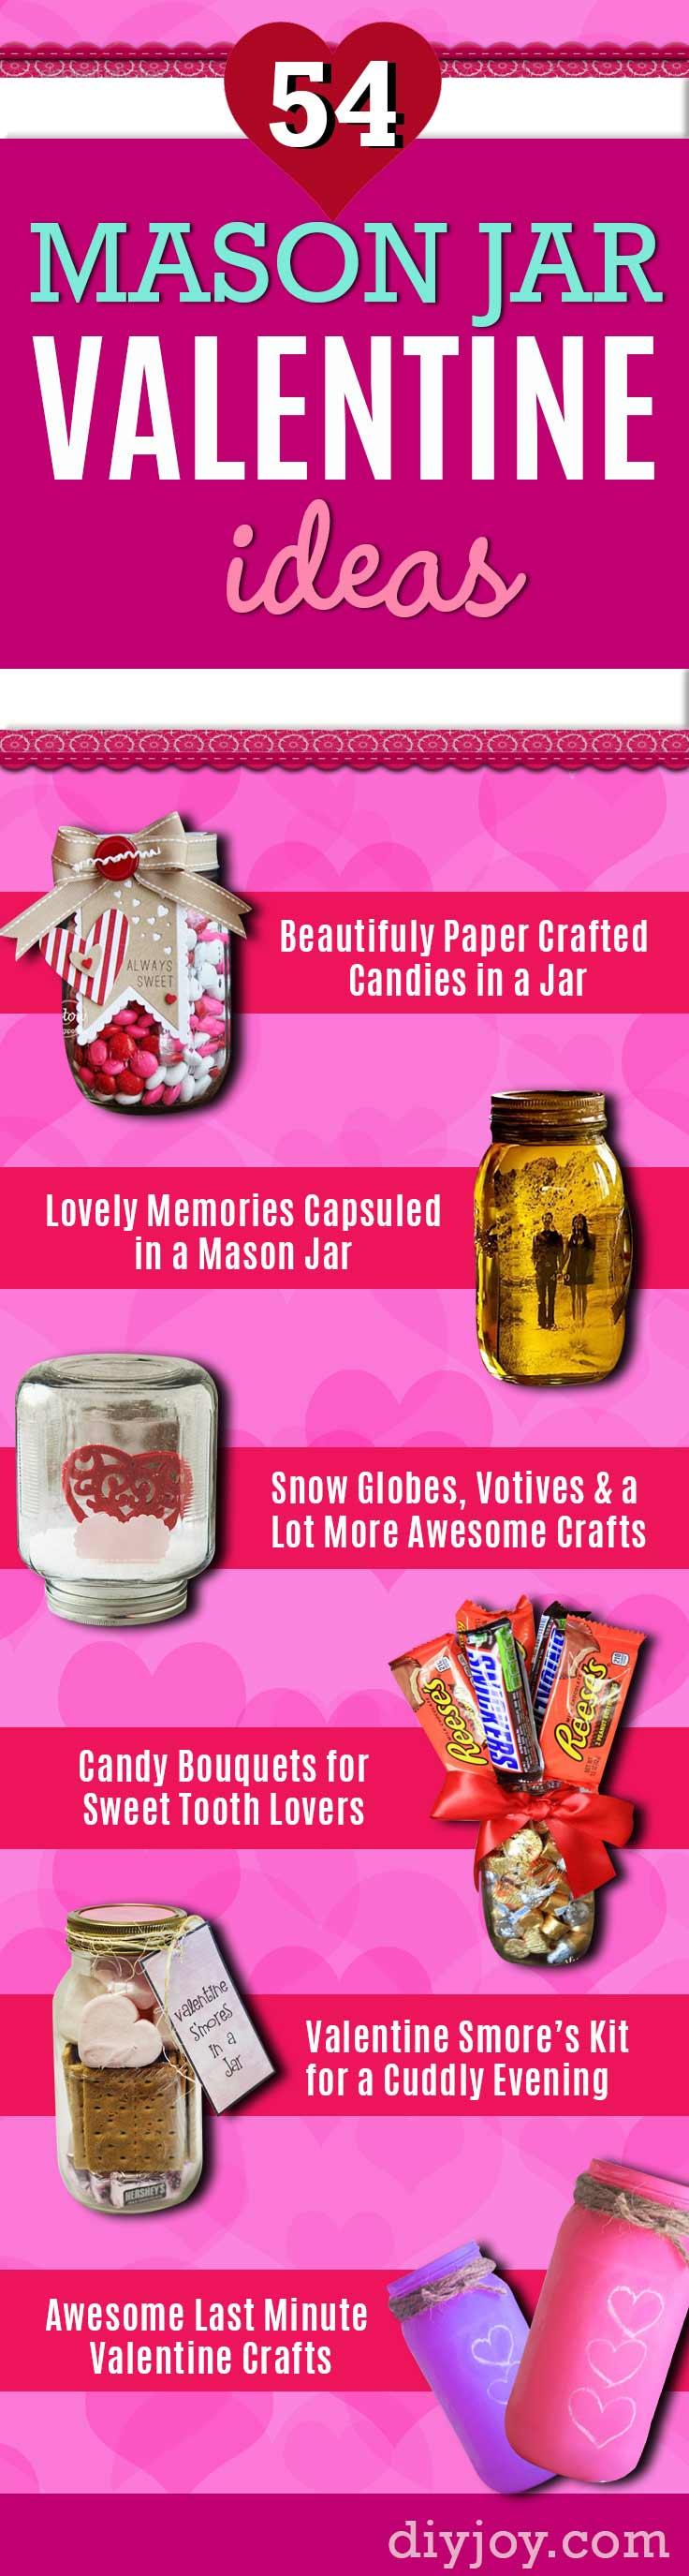 Mason Jar Valentine Gifts - Easy Mason Jar Valentines - Cute Valentines Day Gifts - Easy Mason Jars Crafts for Valentines Day